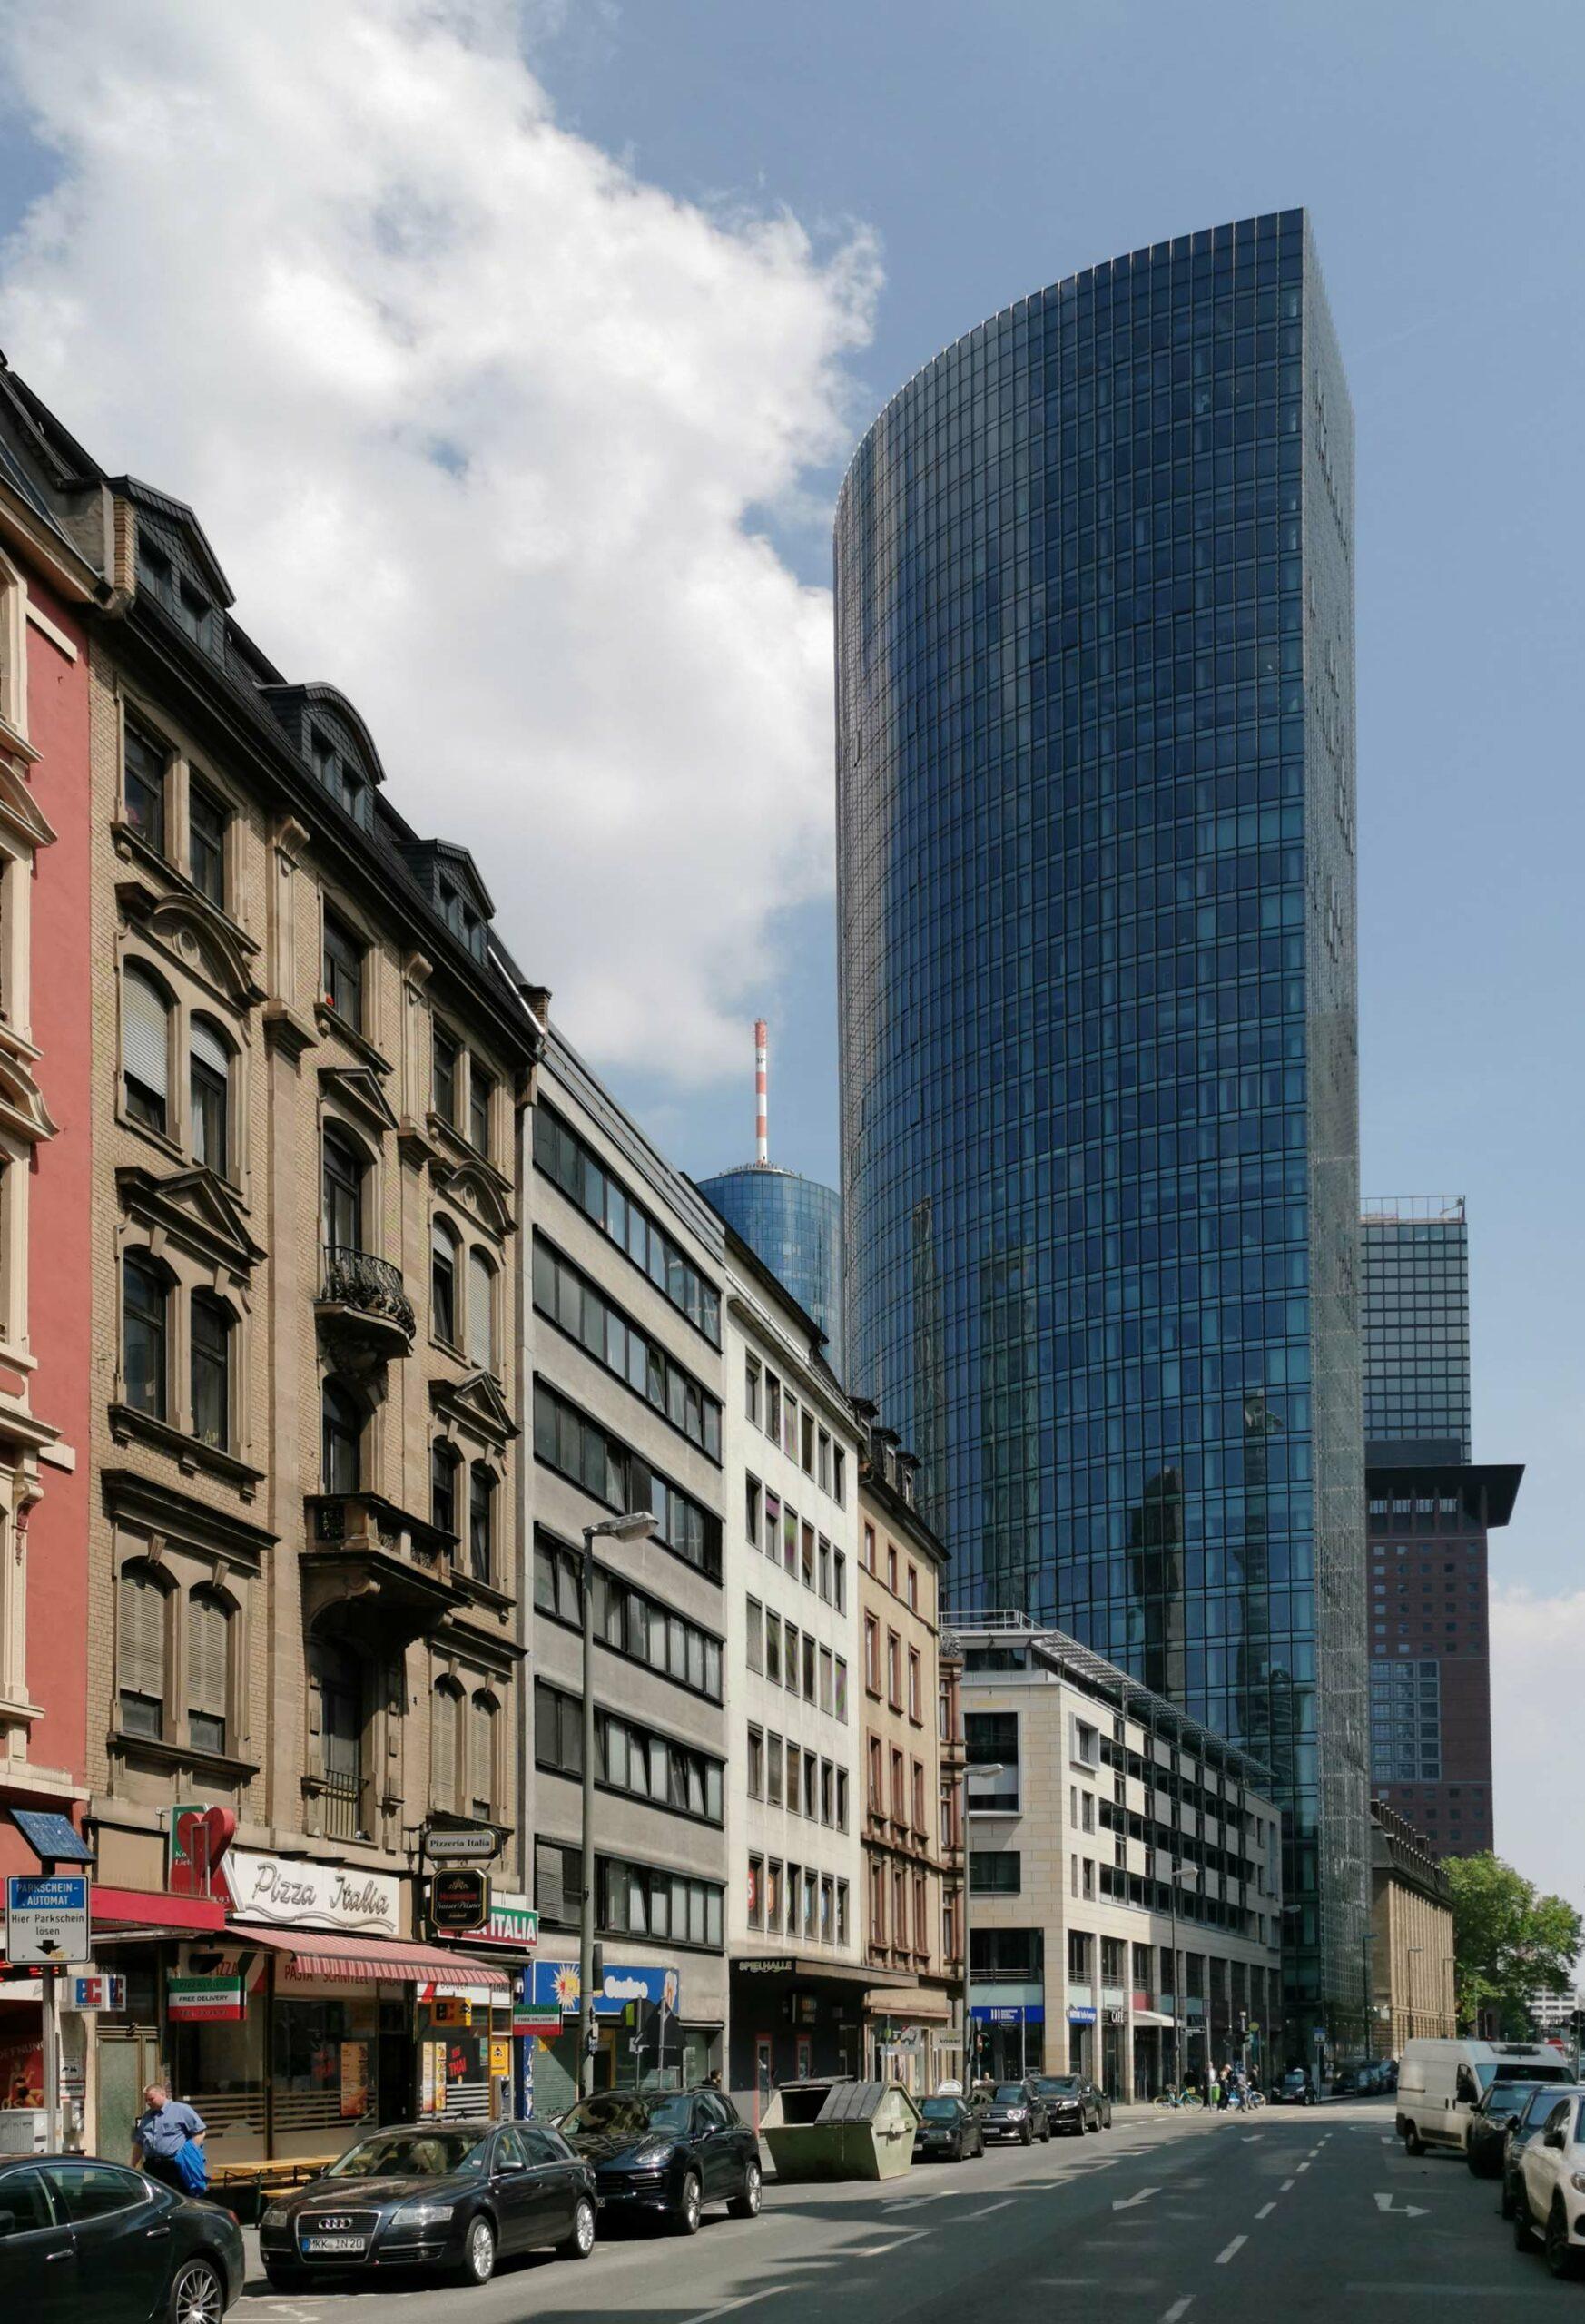 SKYPER Frankfurt Deutsche Bundesbank - SKYPER Hochhaus Frankfurt Bankenviertel